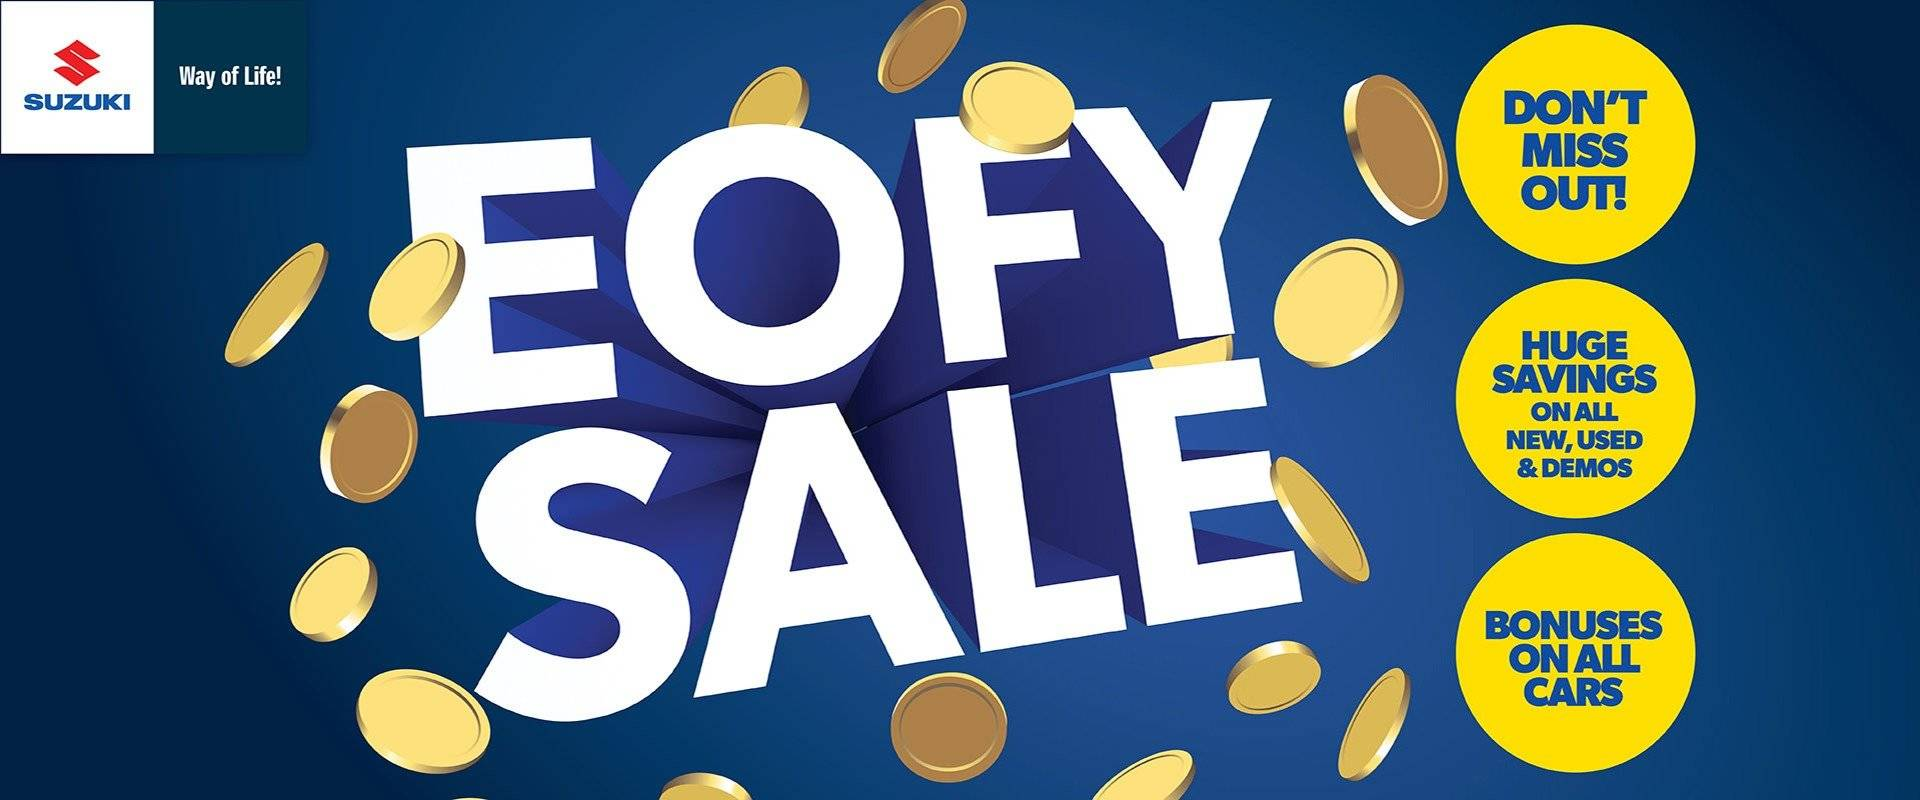 Callaghan Suzuki | EOFY Sale